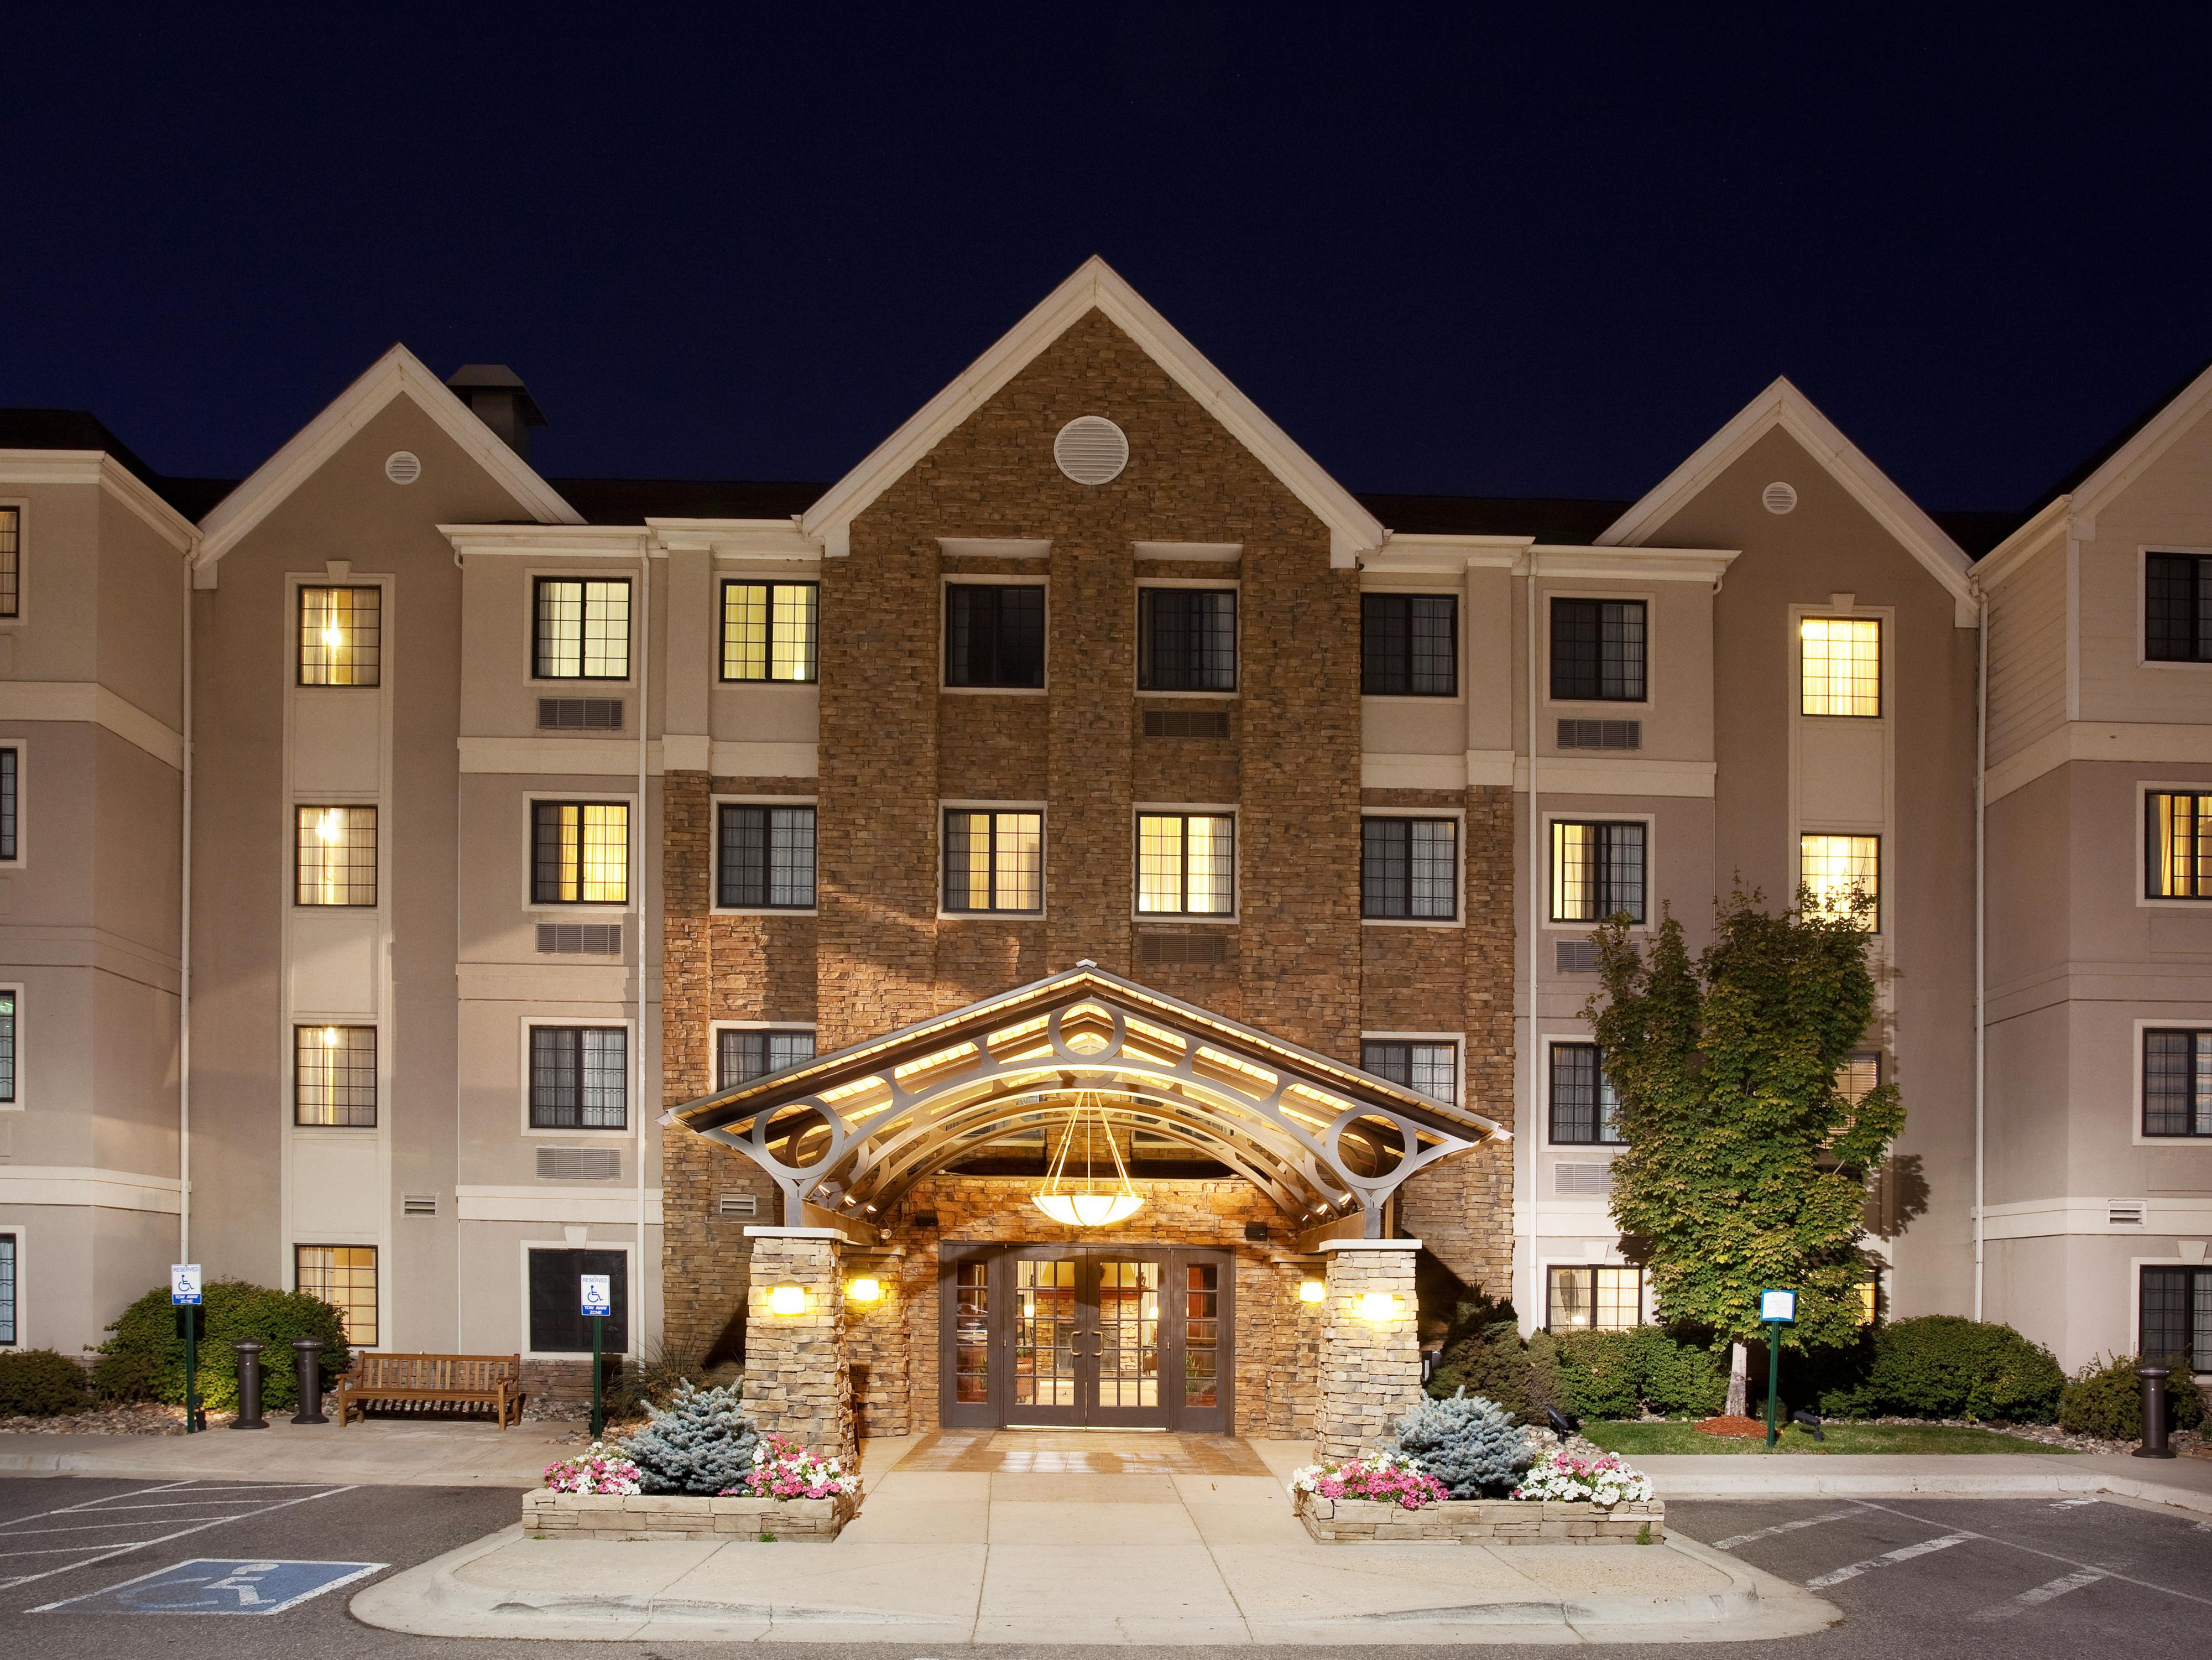 Denver Suite Hotels - Staybridge Suites Denver-Cherry Creek